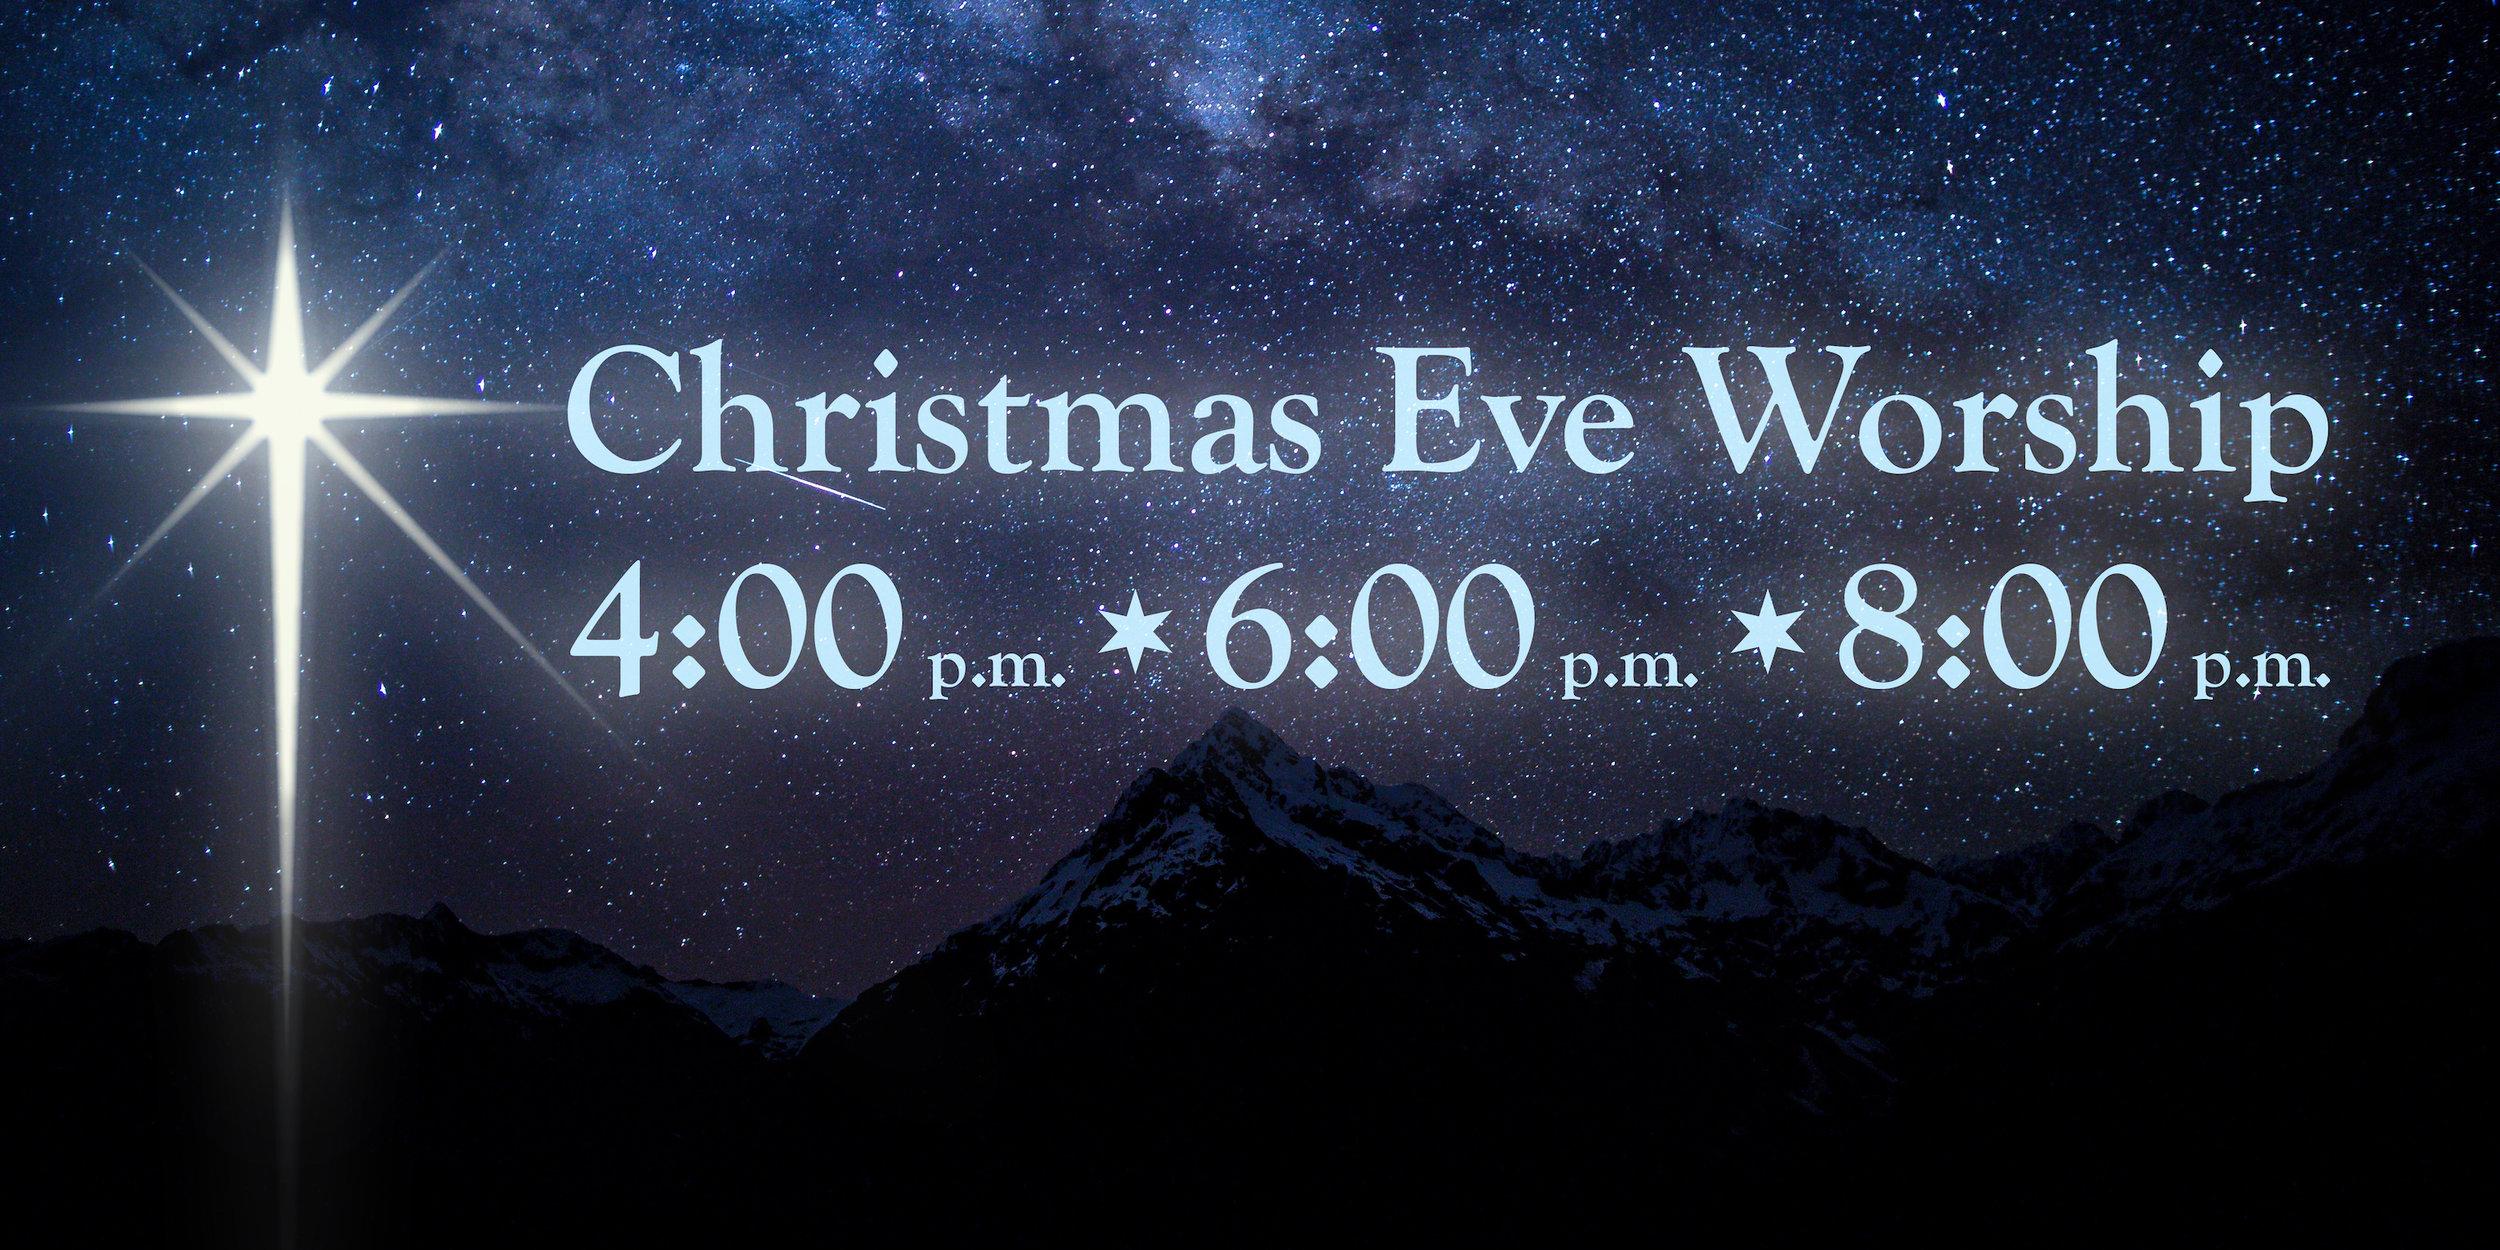 Christmas Eve Worship Times 2018 facebook event cover still v1.jpg